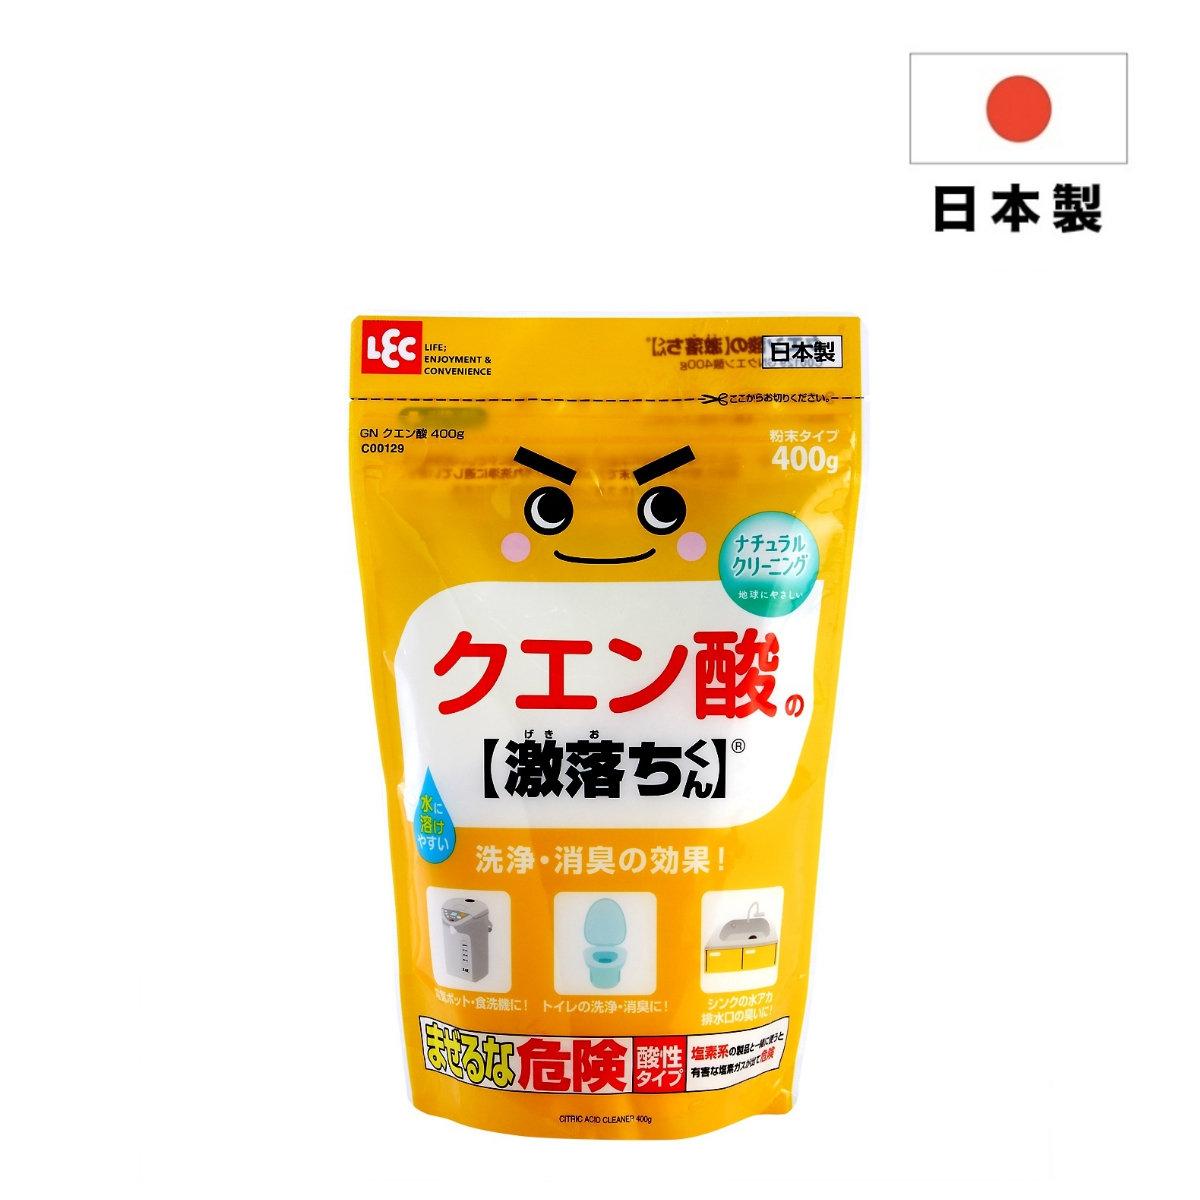 LEC | Citric Acid Cleaner | HKTVmall Online Shopping